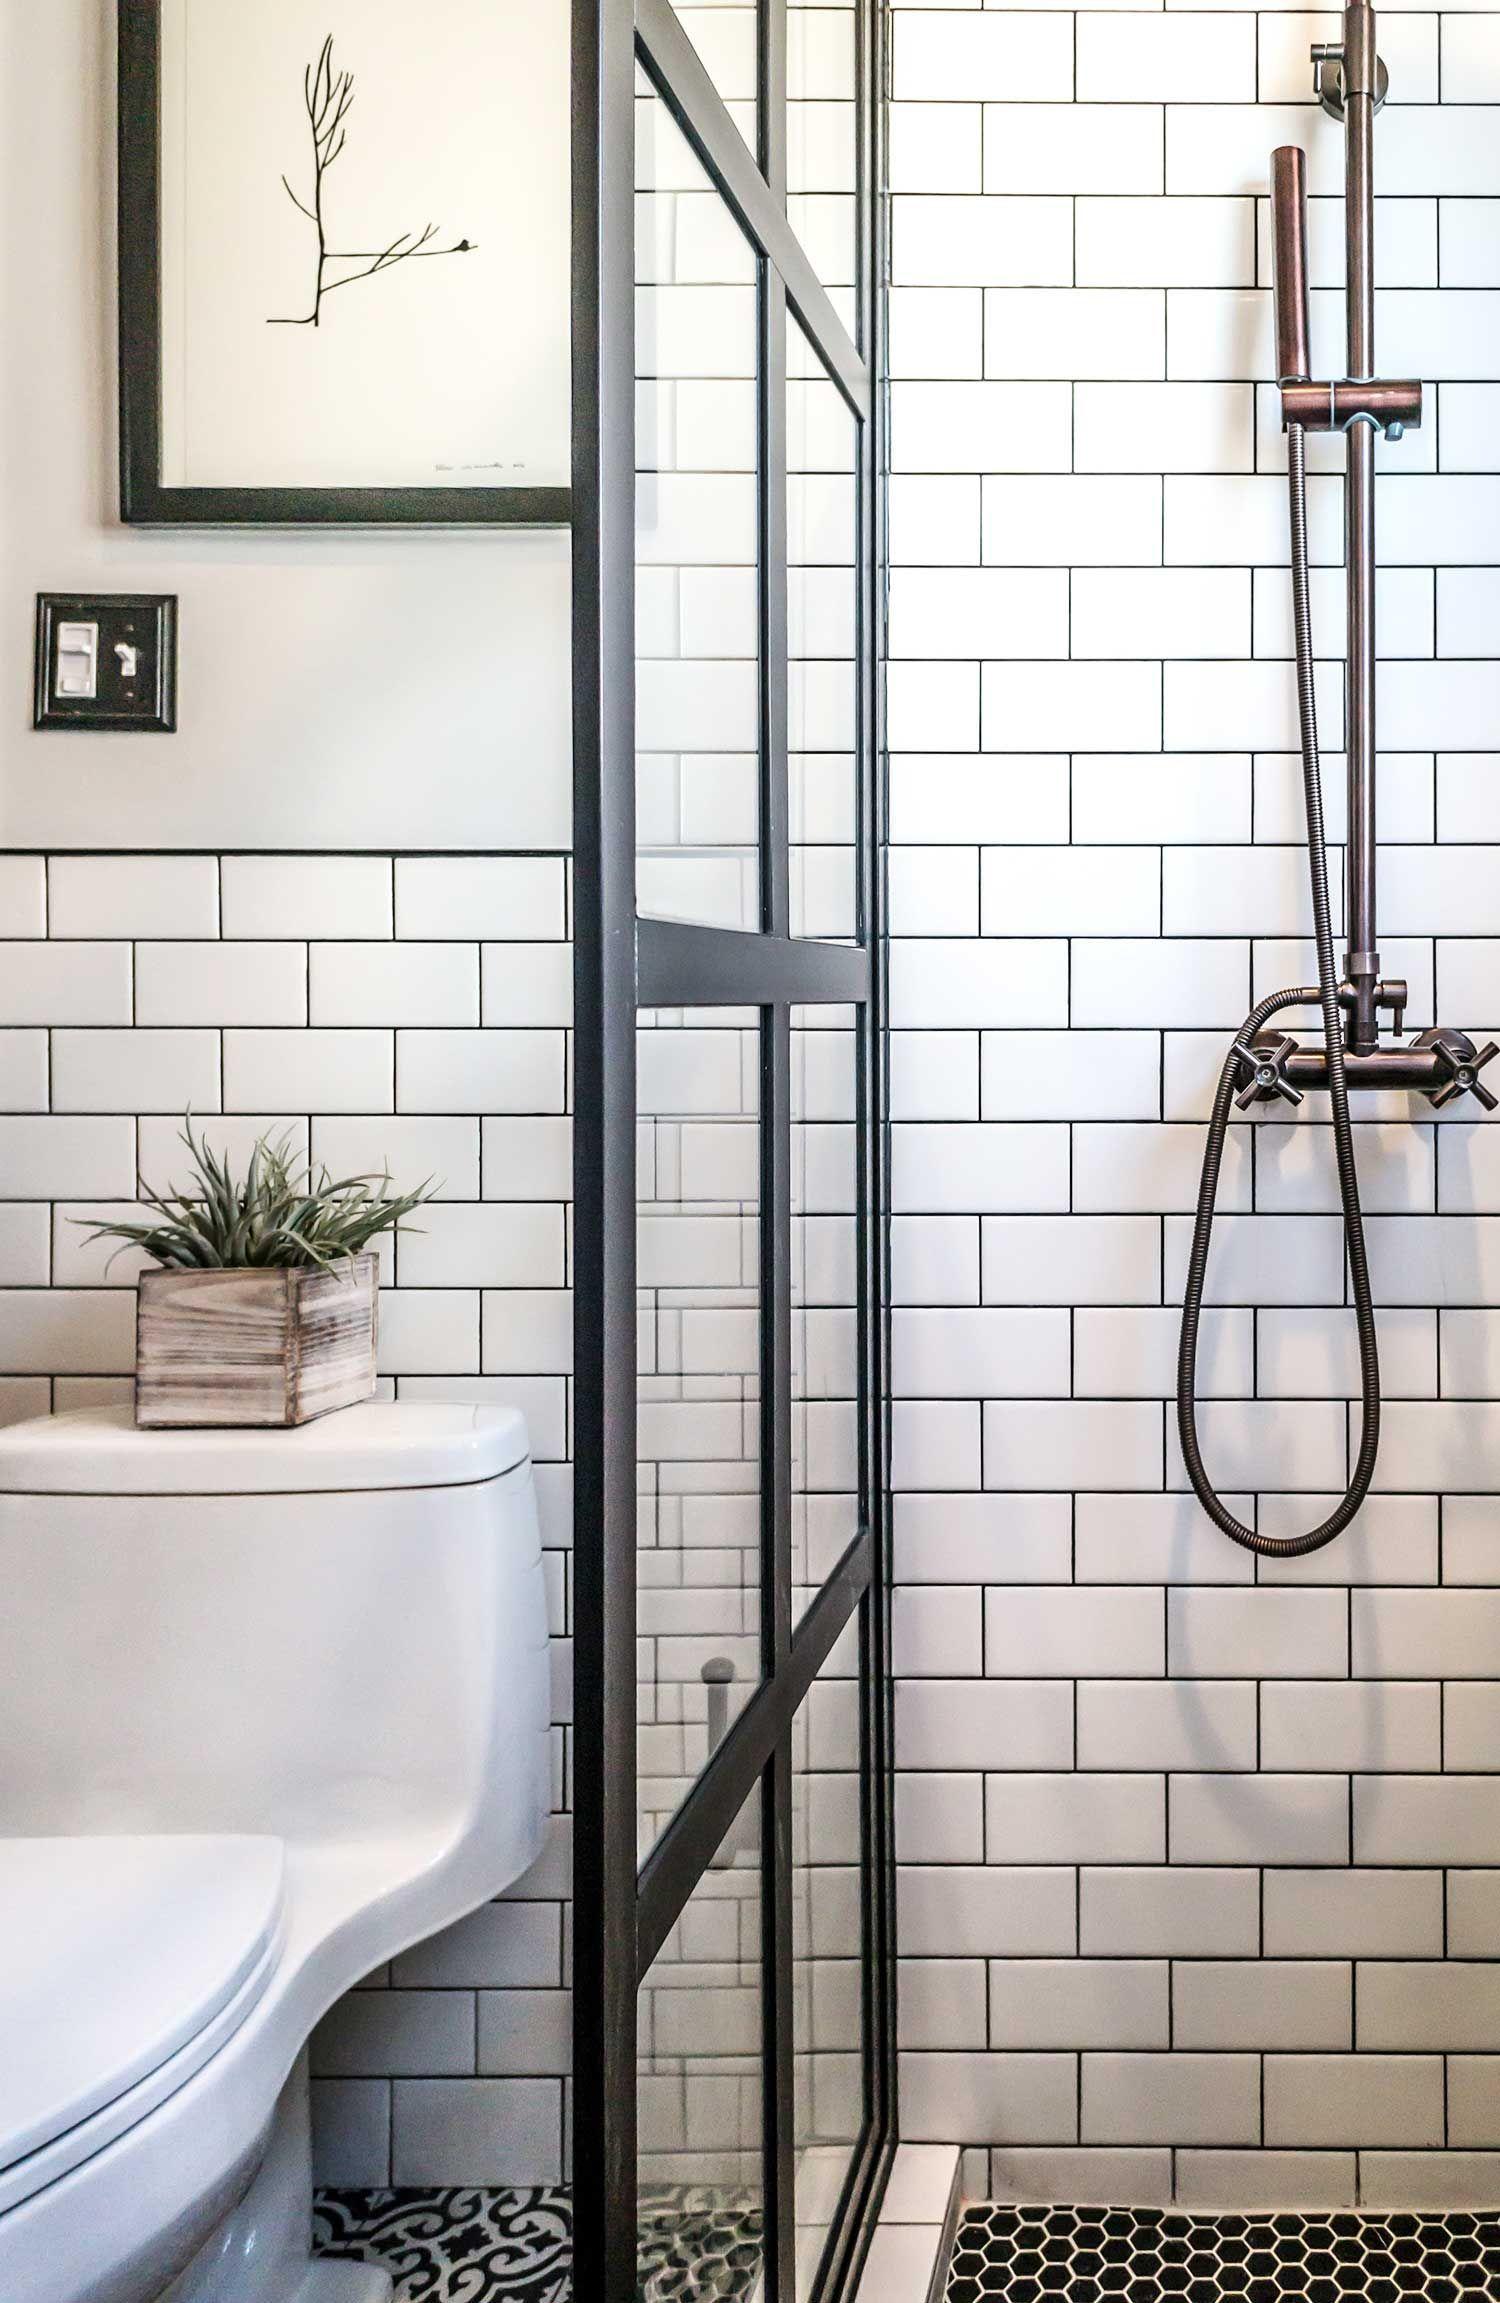 Bathroom Renovation Ideas: bathroom remodel cost, bathroom ideas for ...